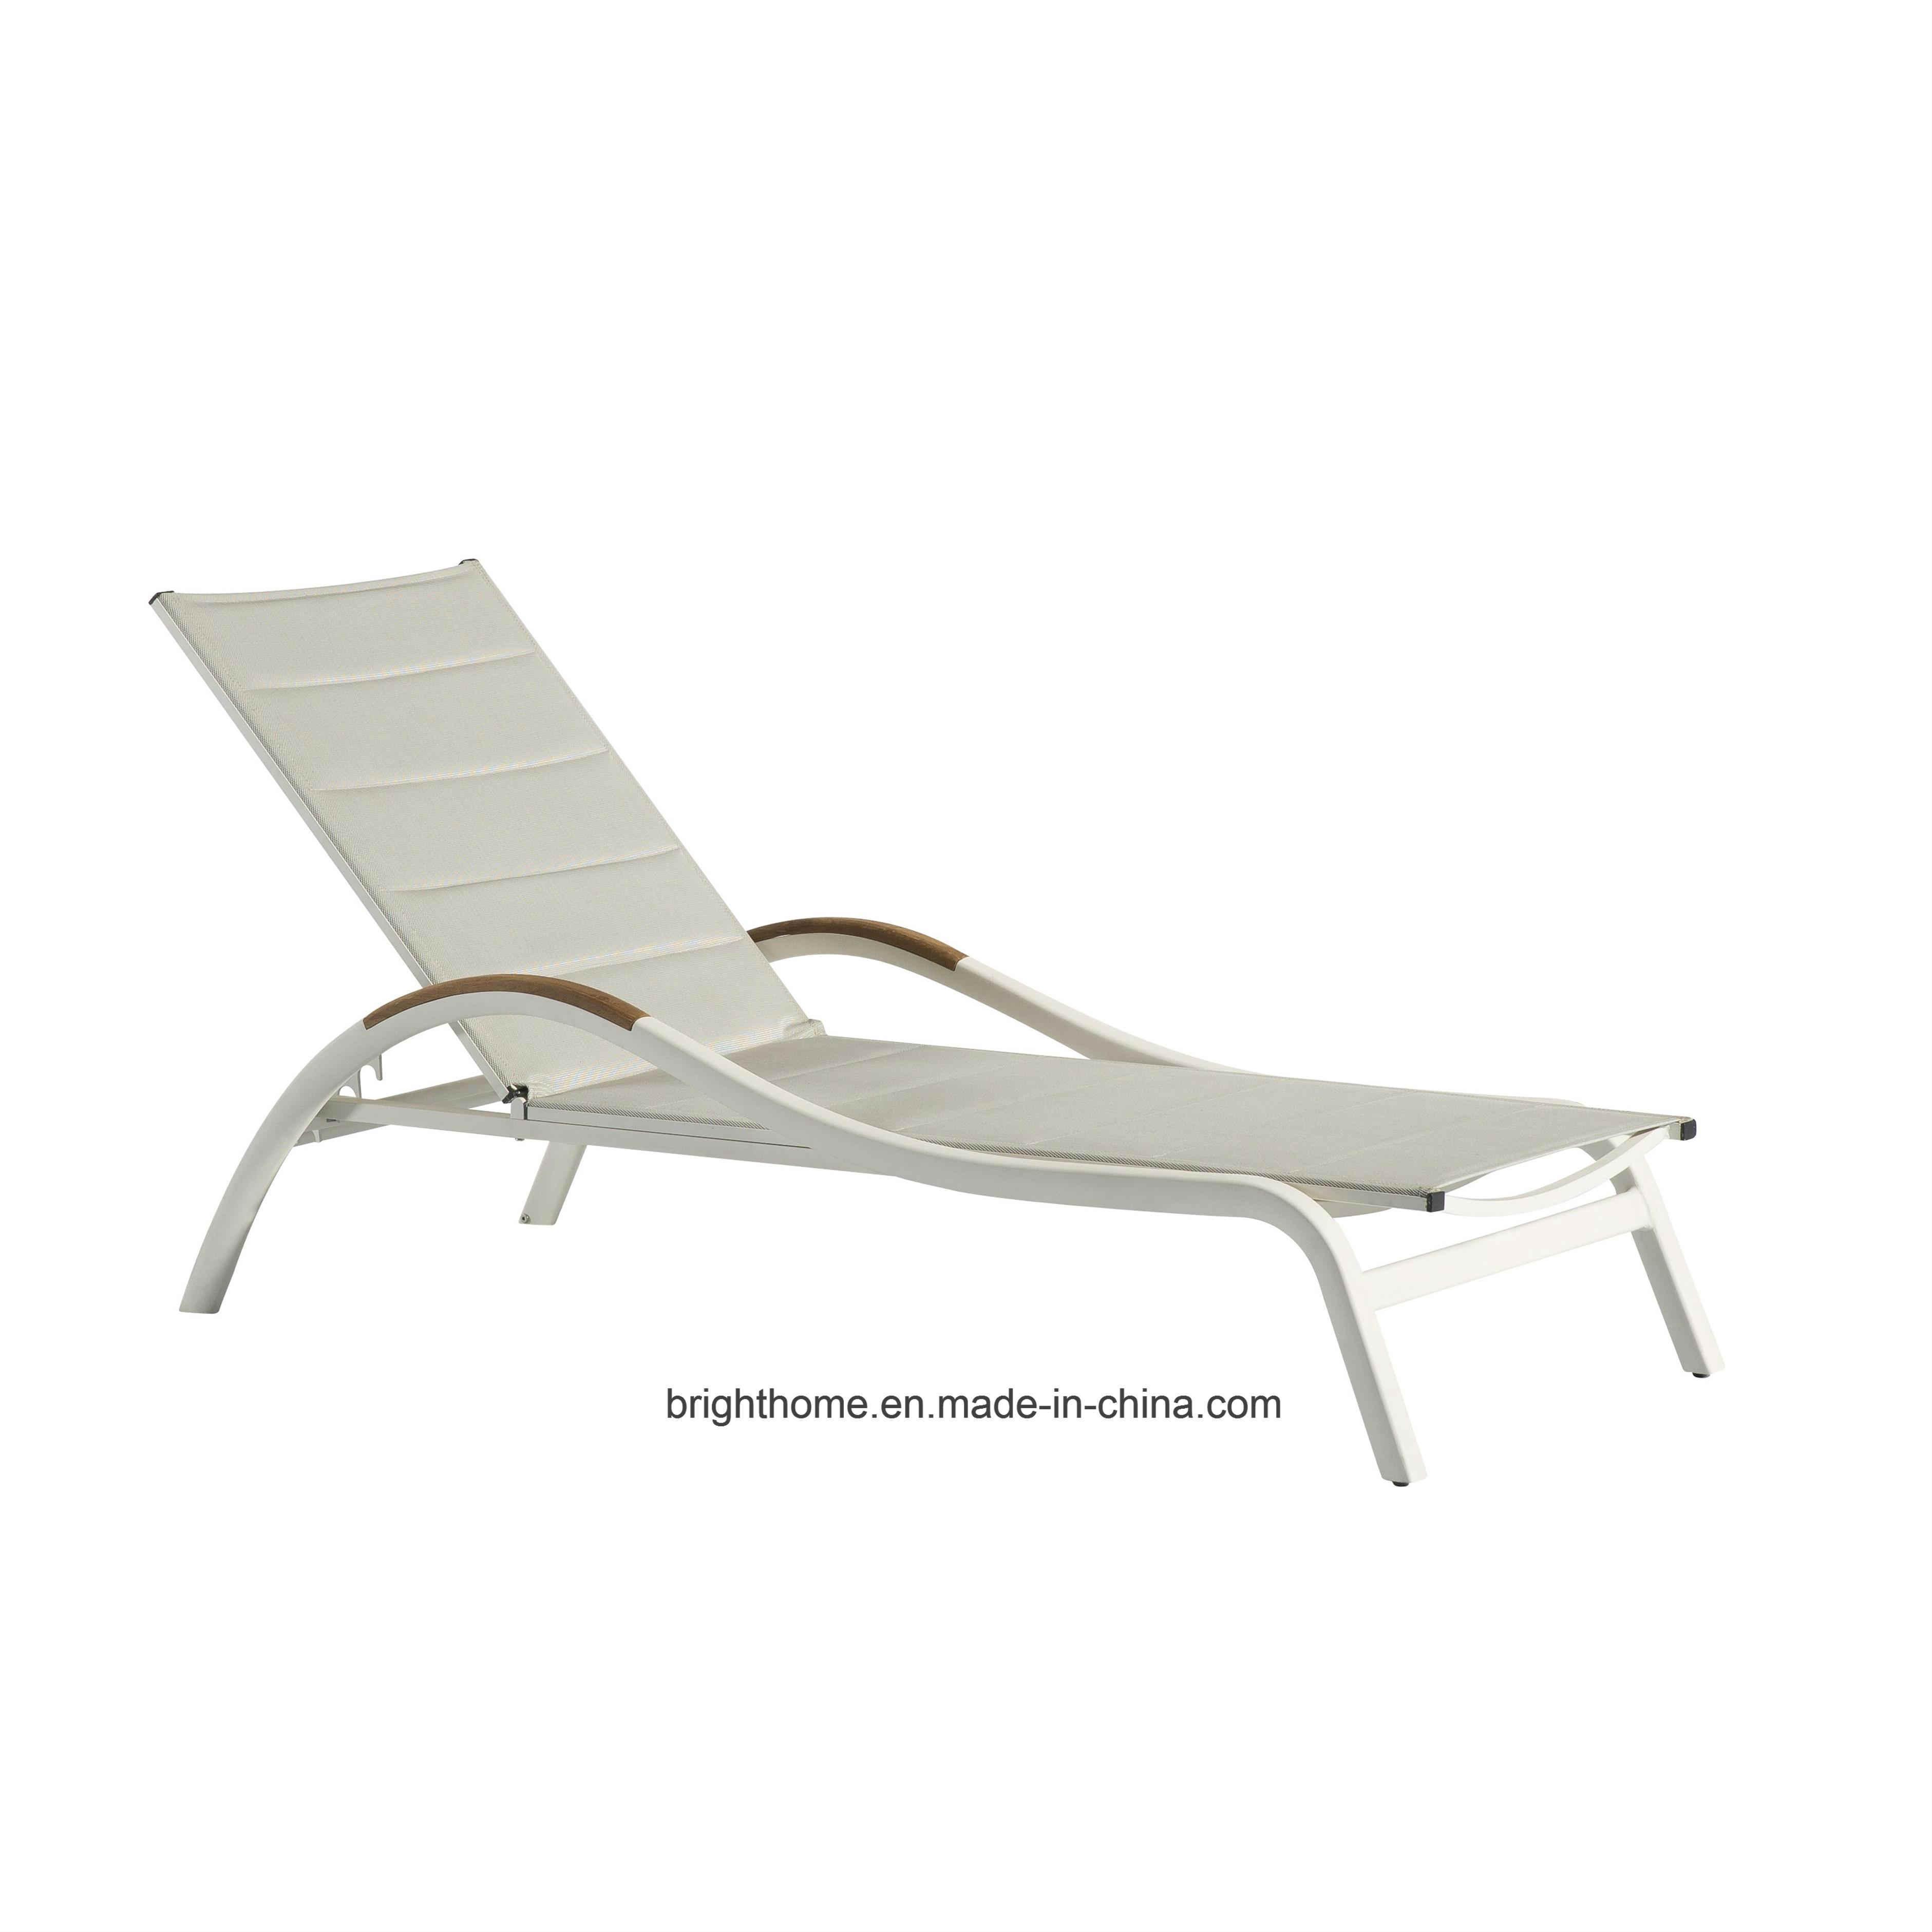 - Textilene Outdoor Chaise Lounge Sonnenliege, Aluminiumpool